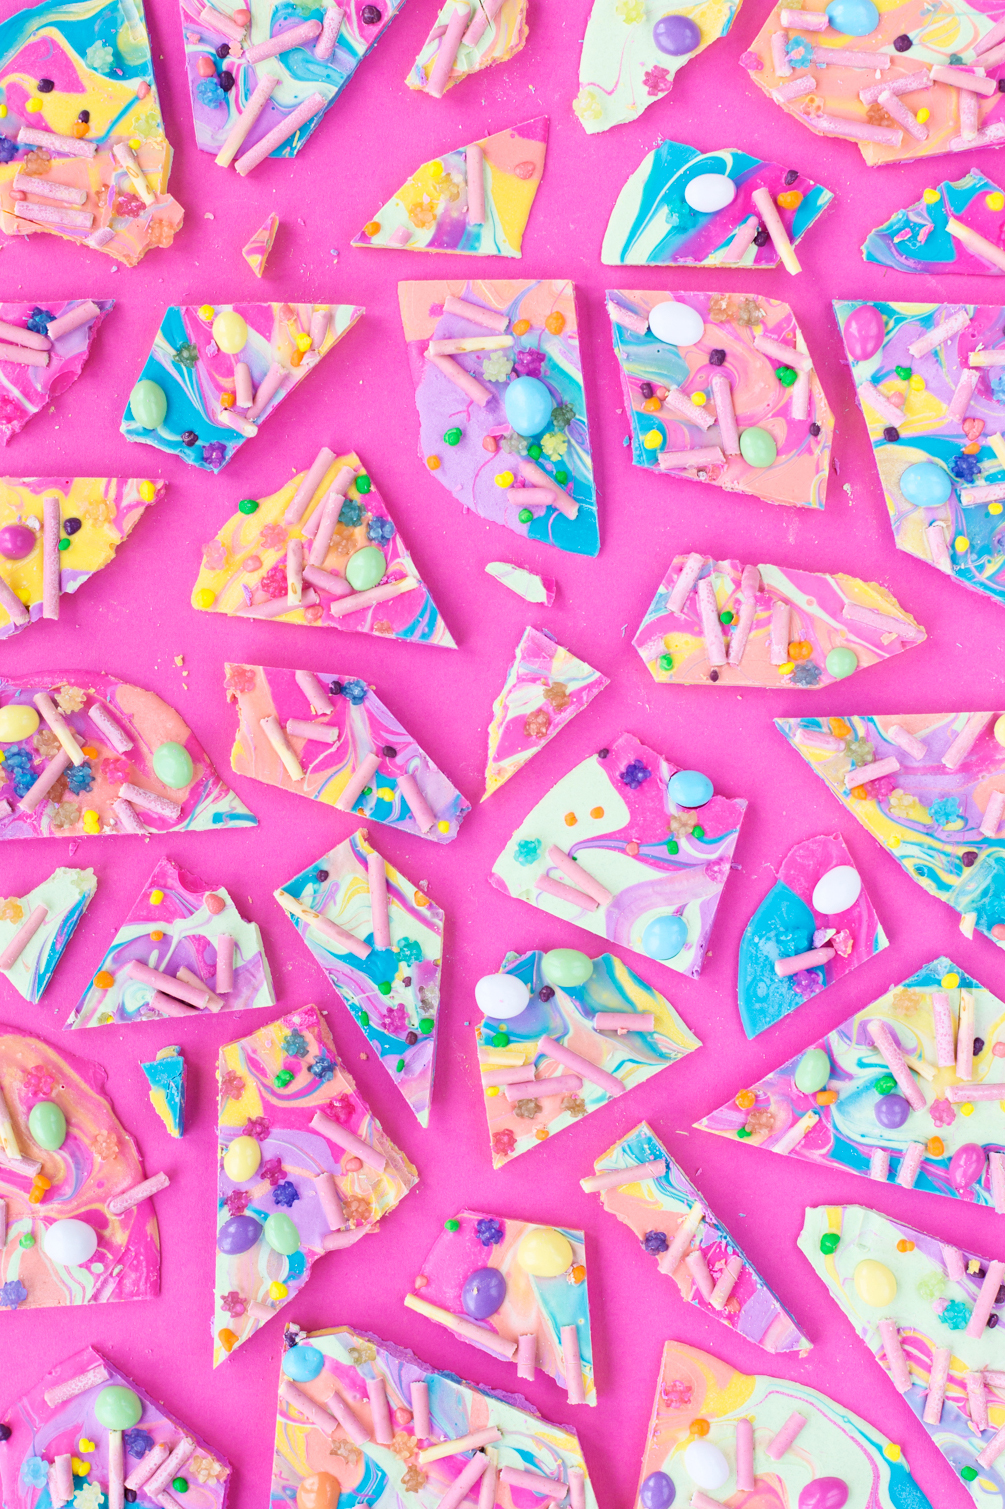 Cute Holographic Wallpapers Summer Fun White Chocolate Pocky Bark Studio Diy